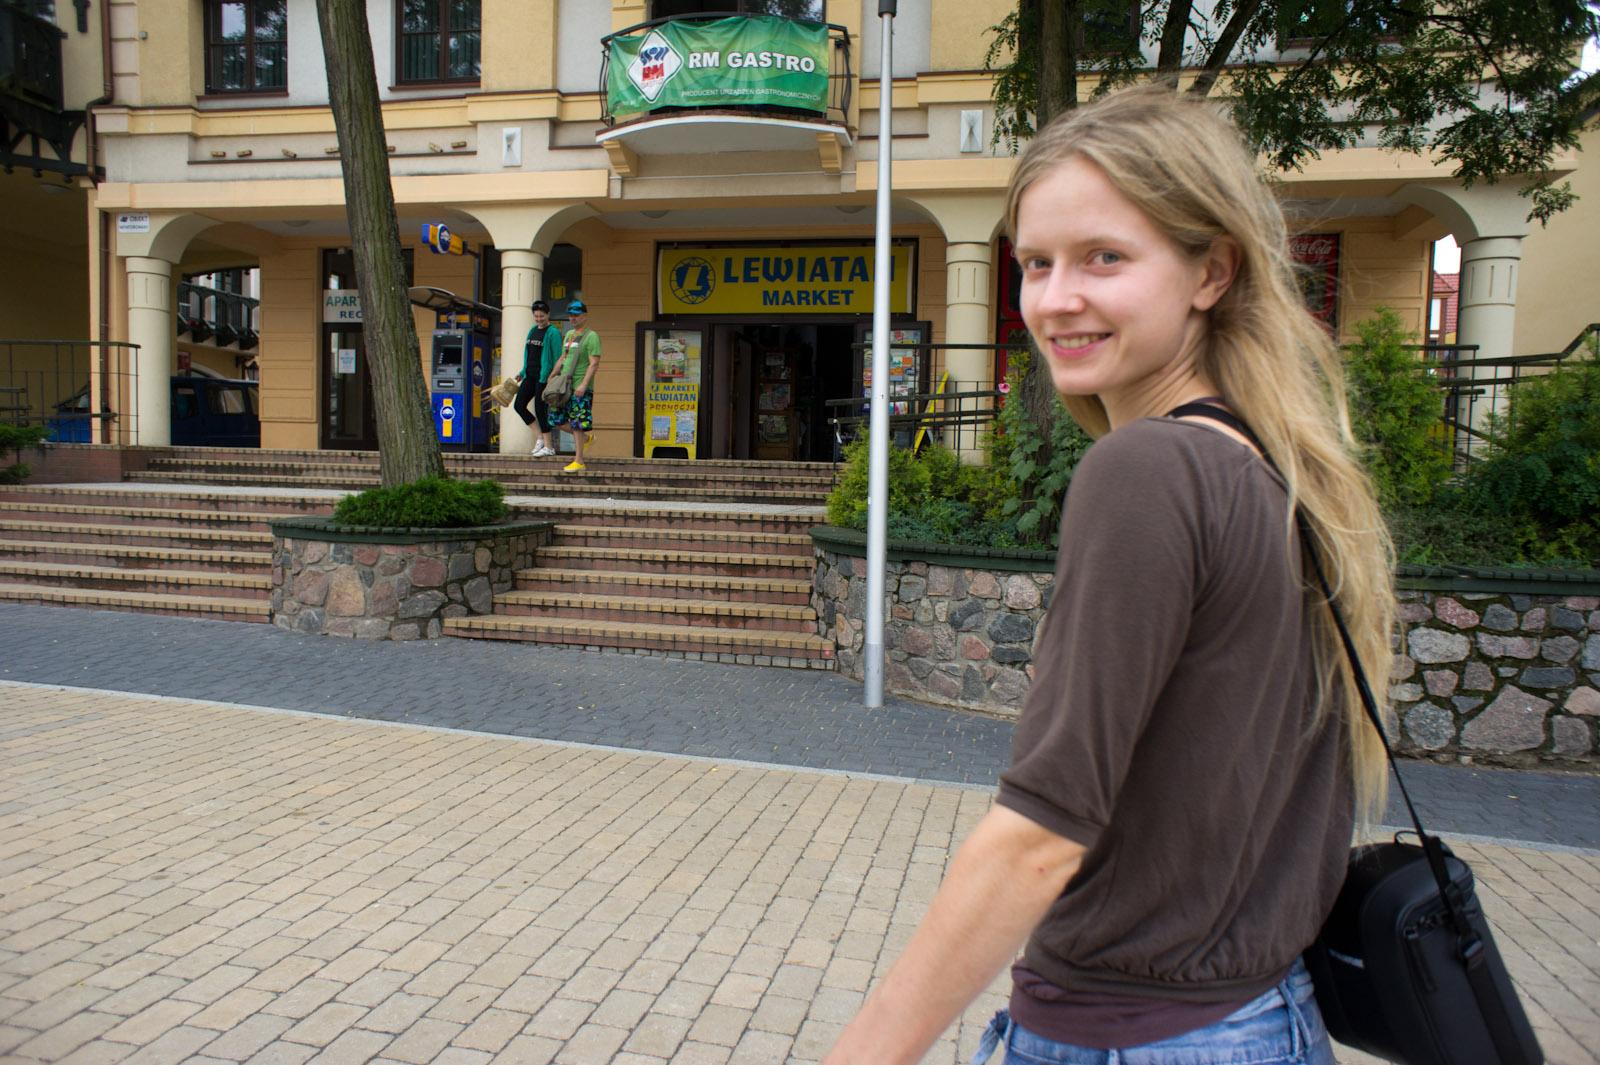 Hanne in Mikołajki, Poland